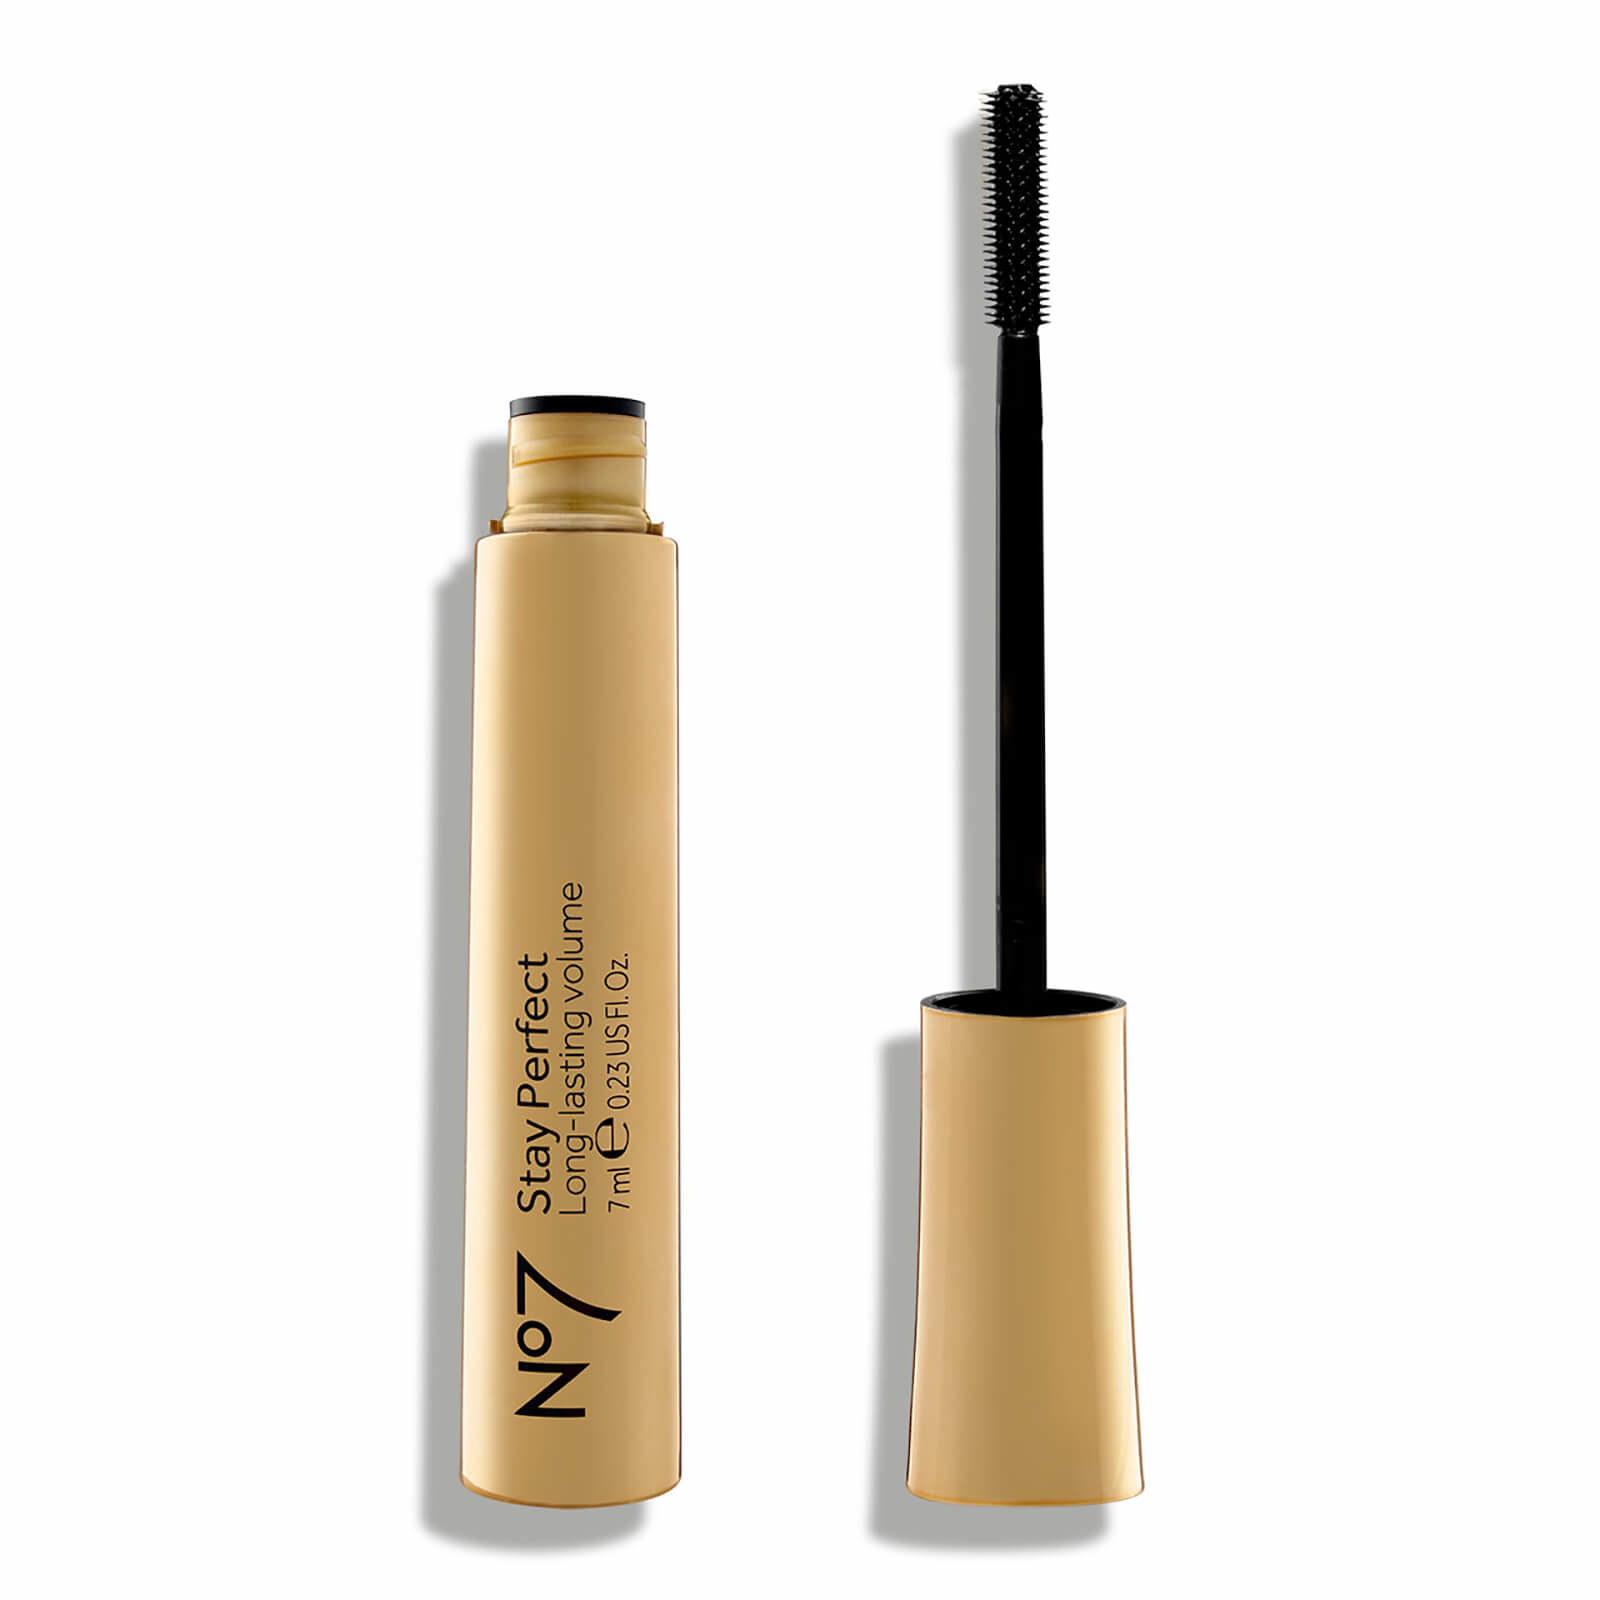 a gold tube of black mascara